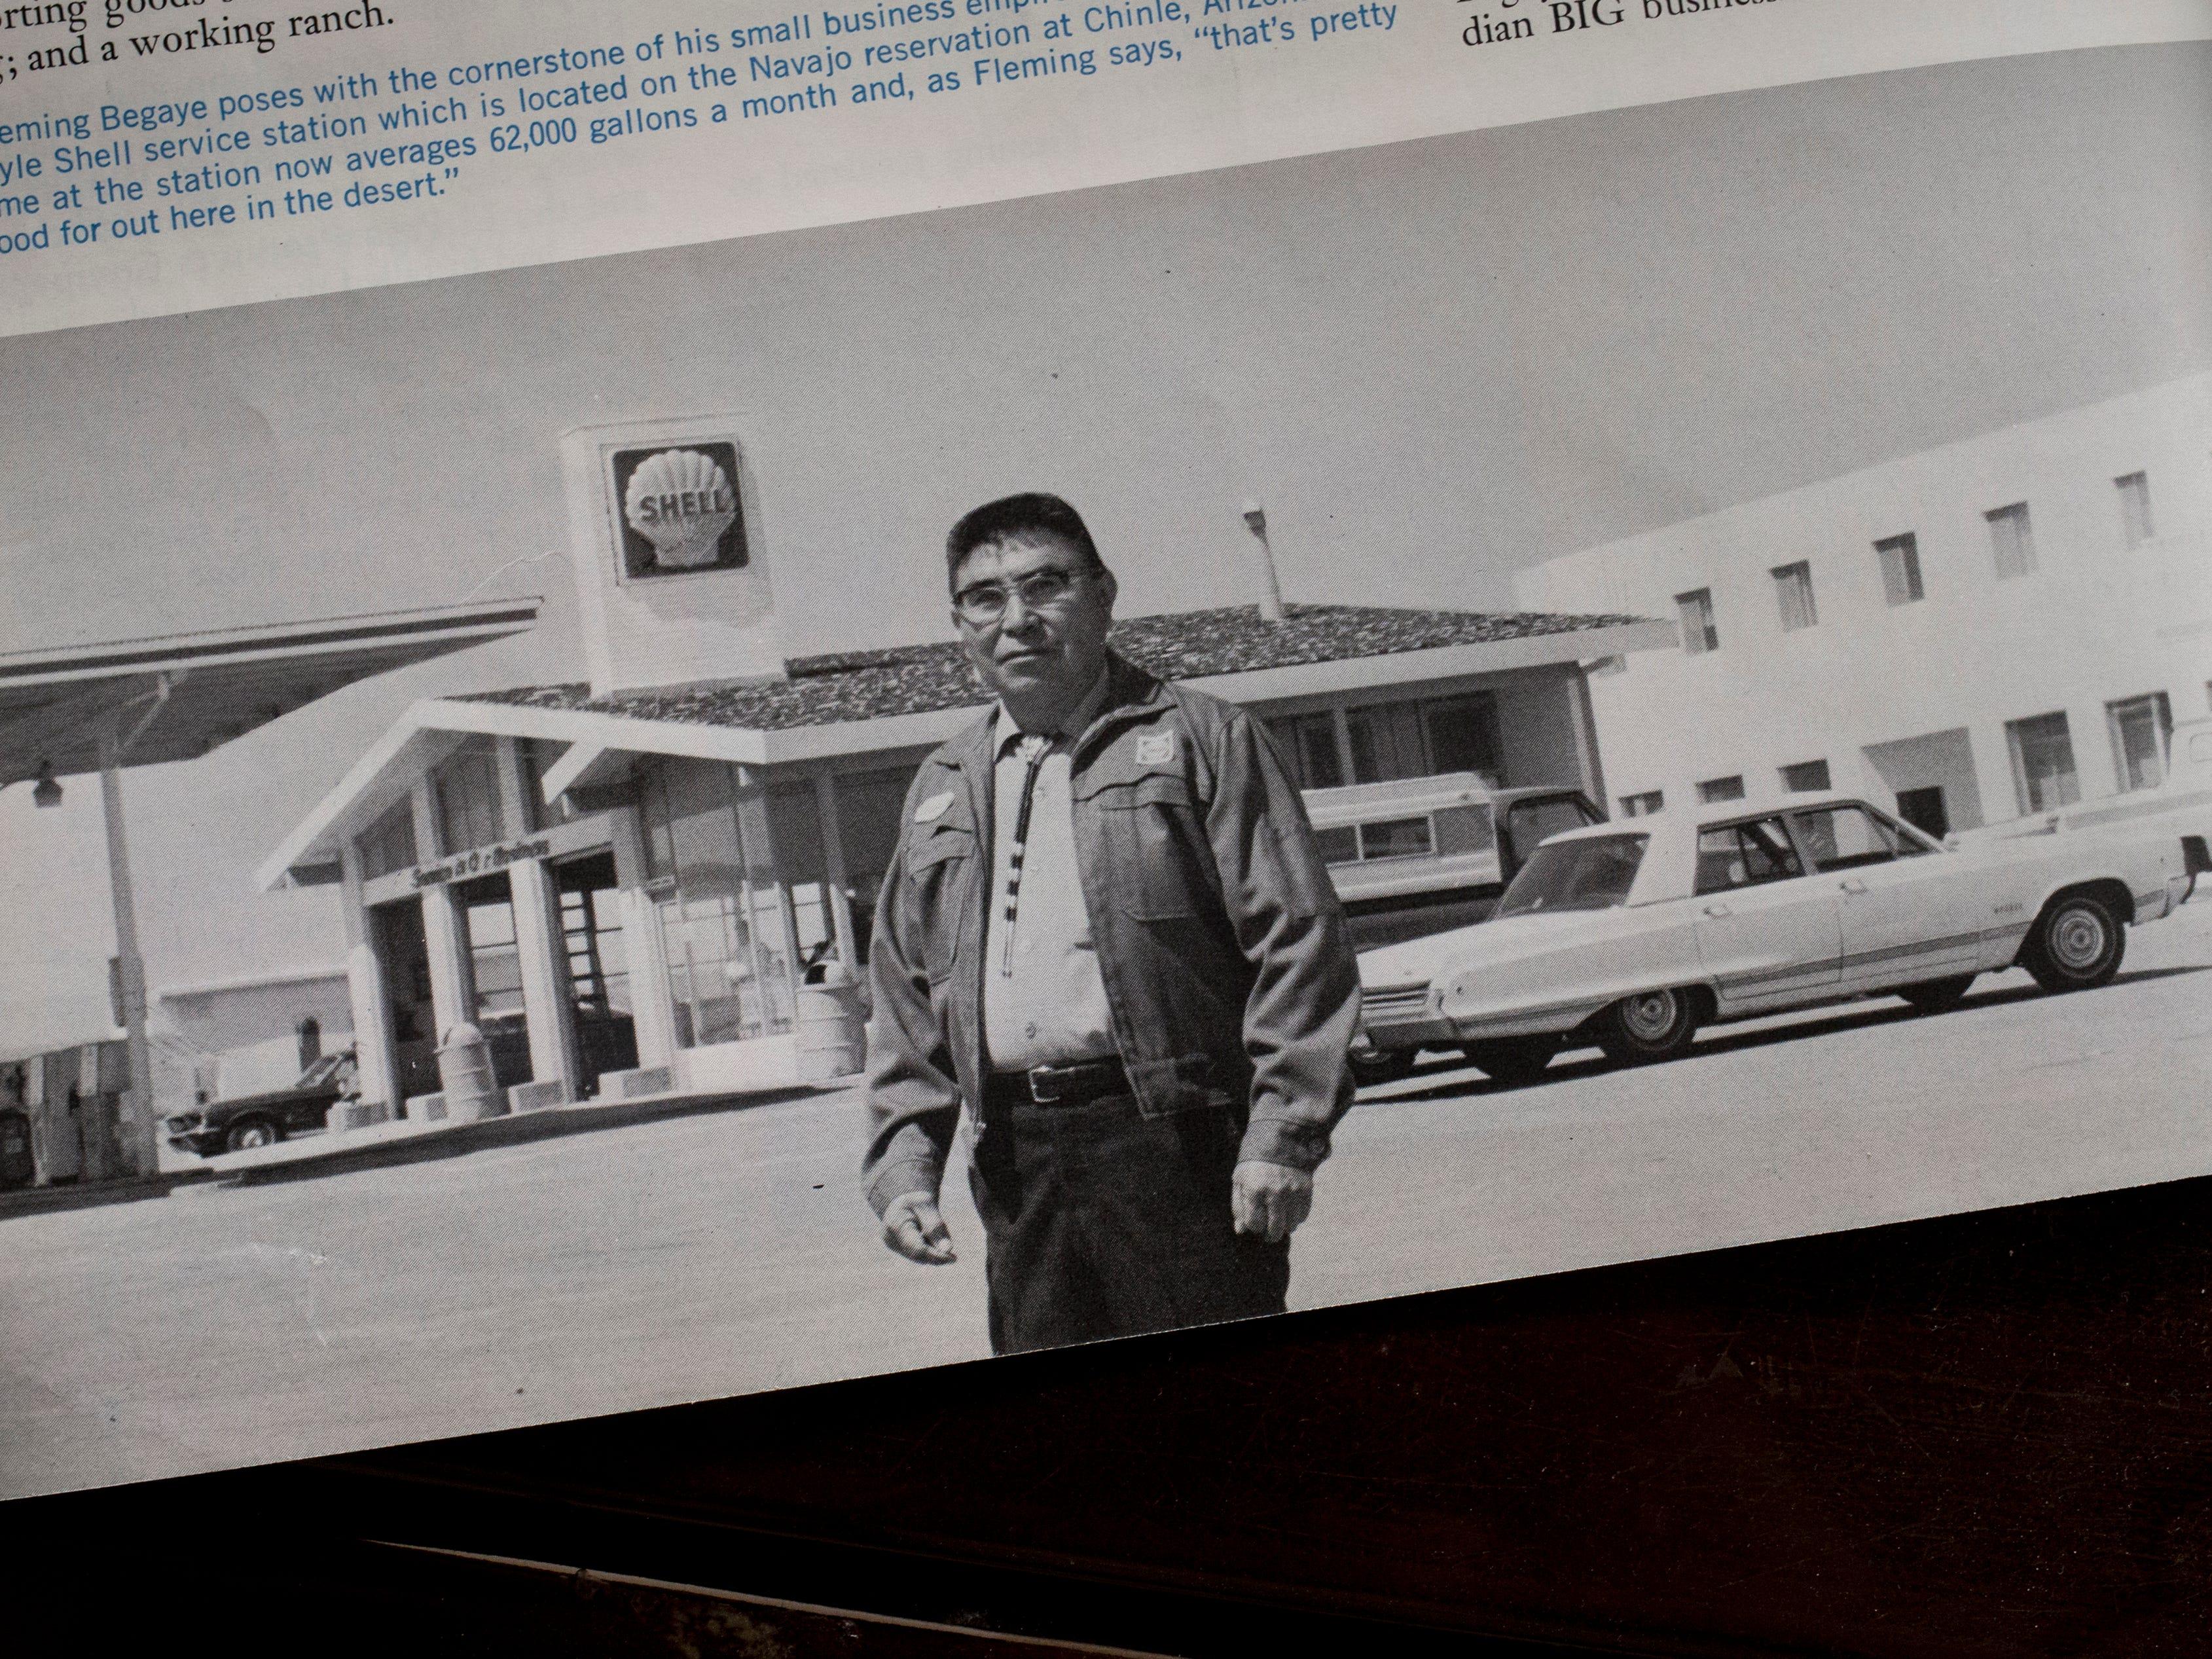 A photo of Fleming Begaye Sr. from a 1971 Shell Progress magazine.